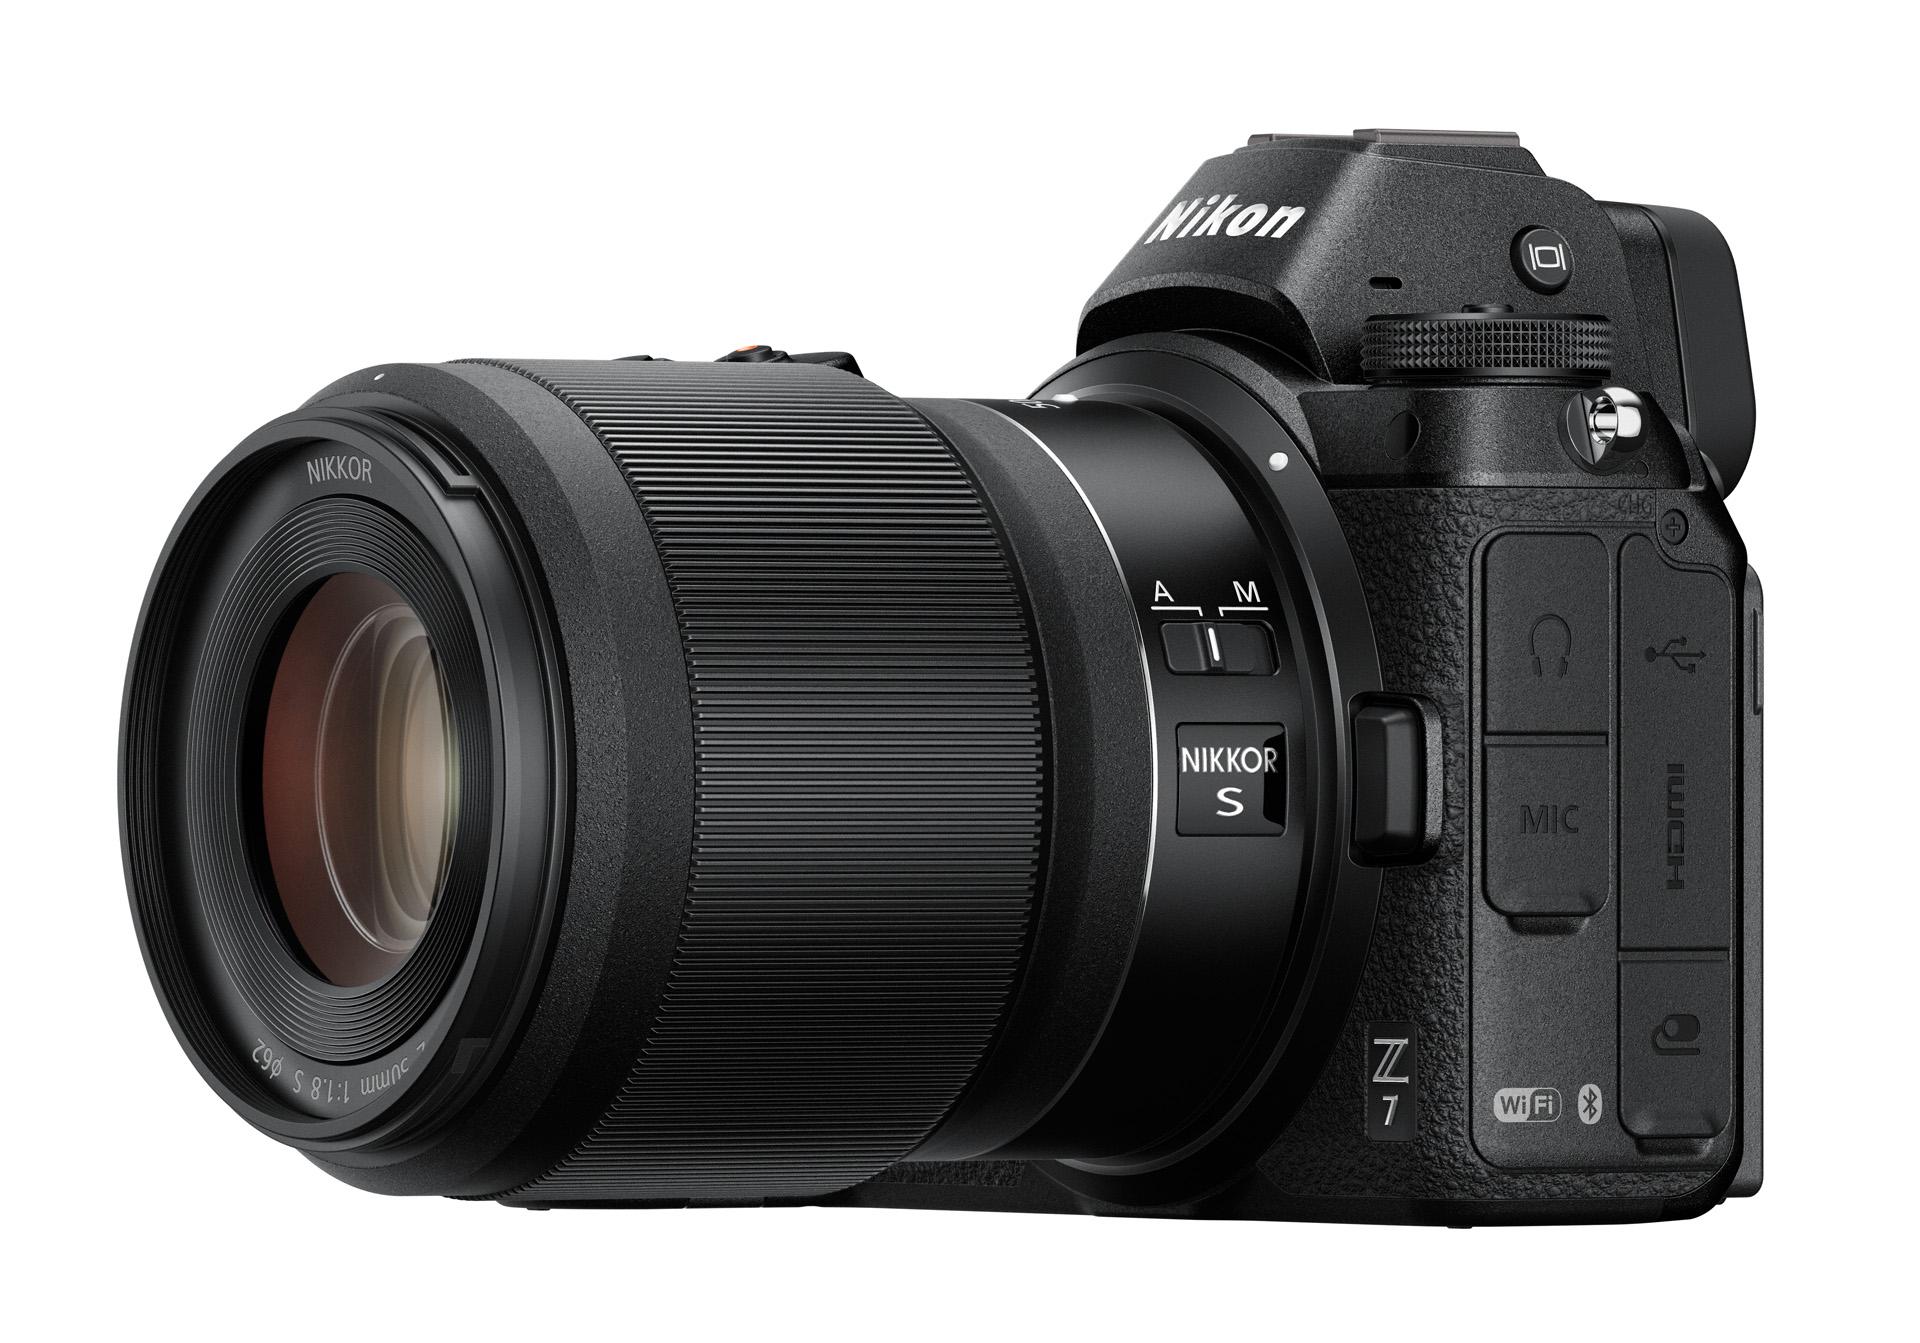 Nikkor Z 50 mm f/1,8 S na těle Nikon Z7